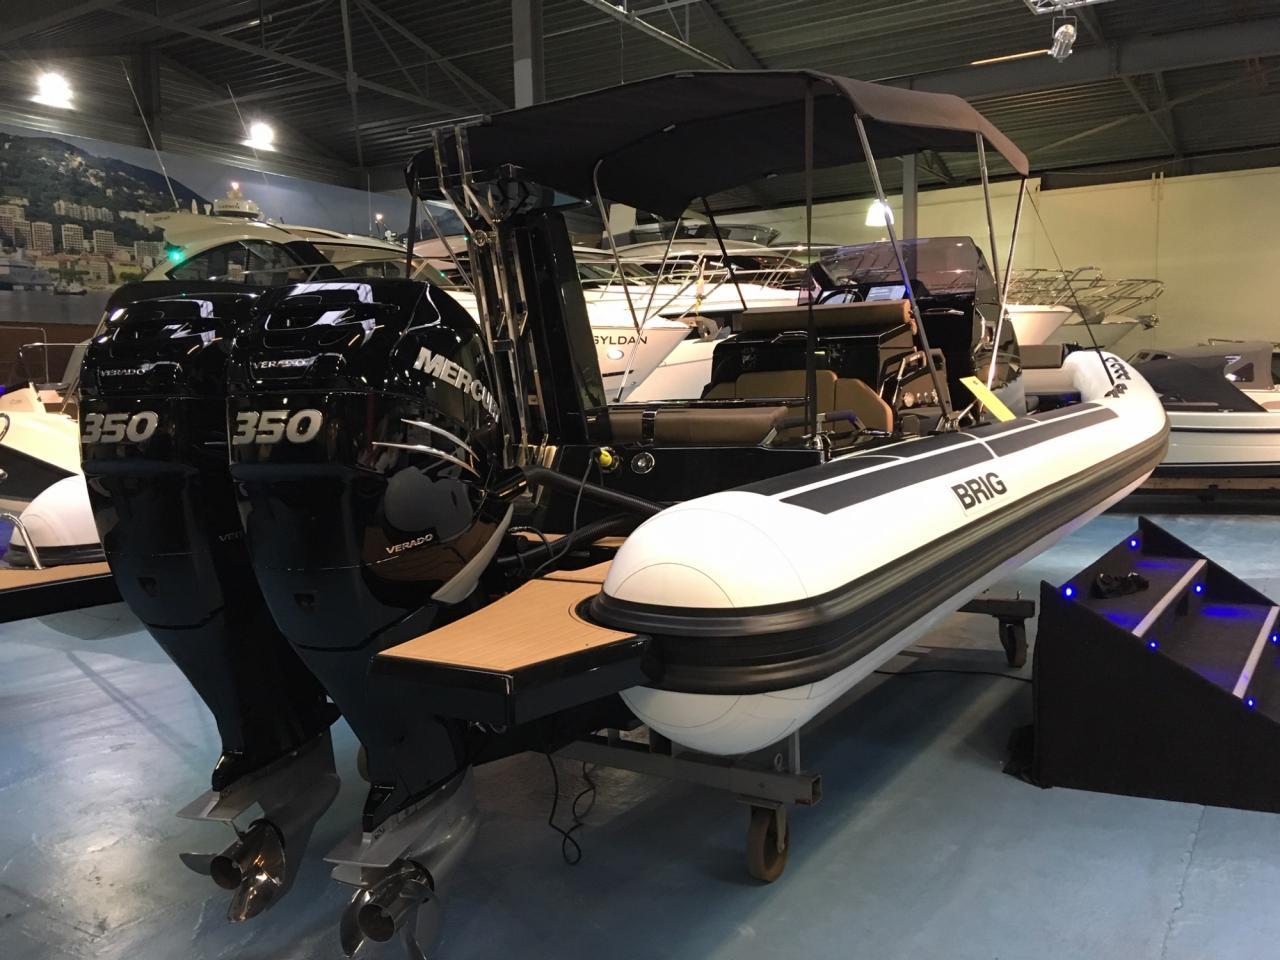 Brig Eagle 10 rib met 2x Mercury Verado 350 pk! 3